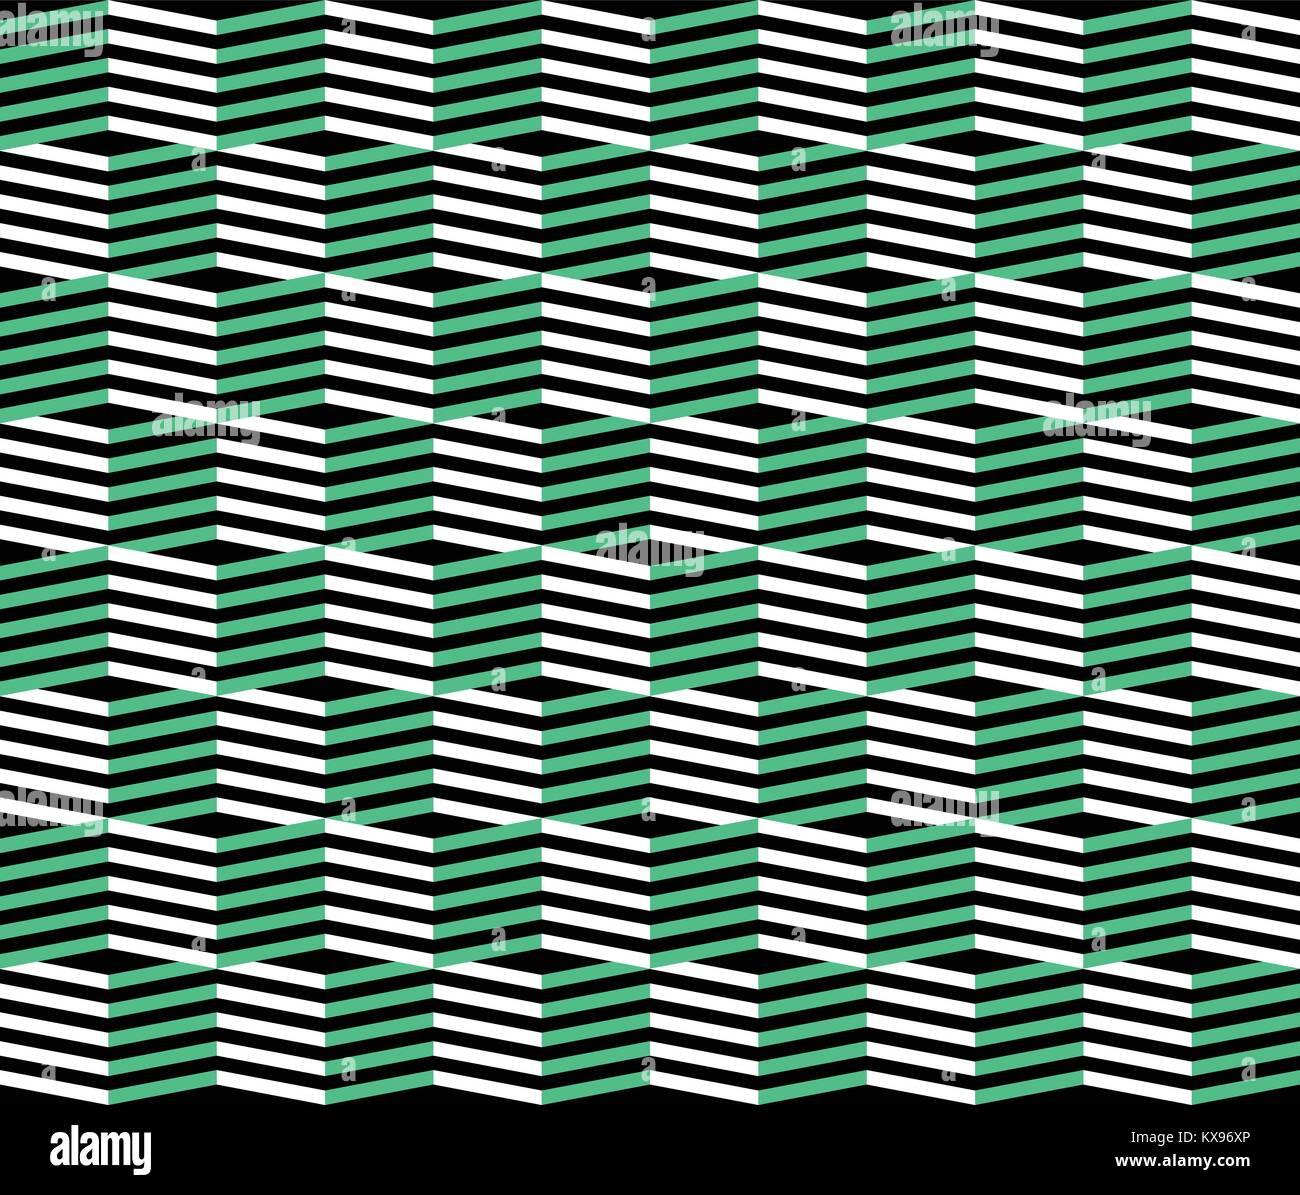 Retro zigzag pattern. Abstract geometric background, Simple illustration. Print clothing, shirt, sundress, dress, - Stock Vector